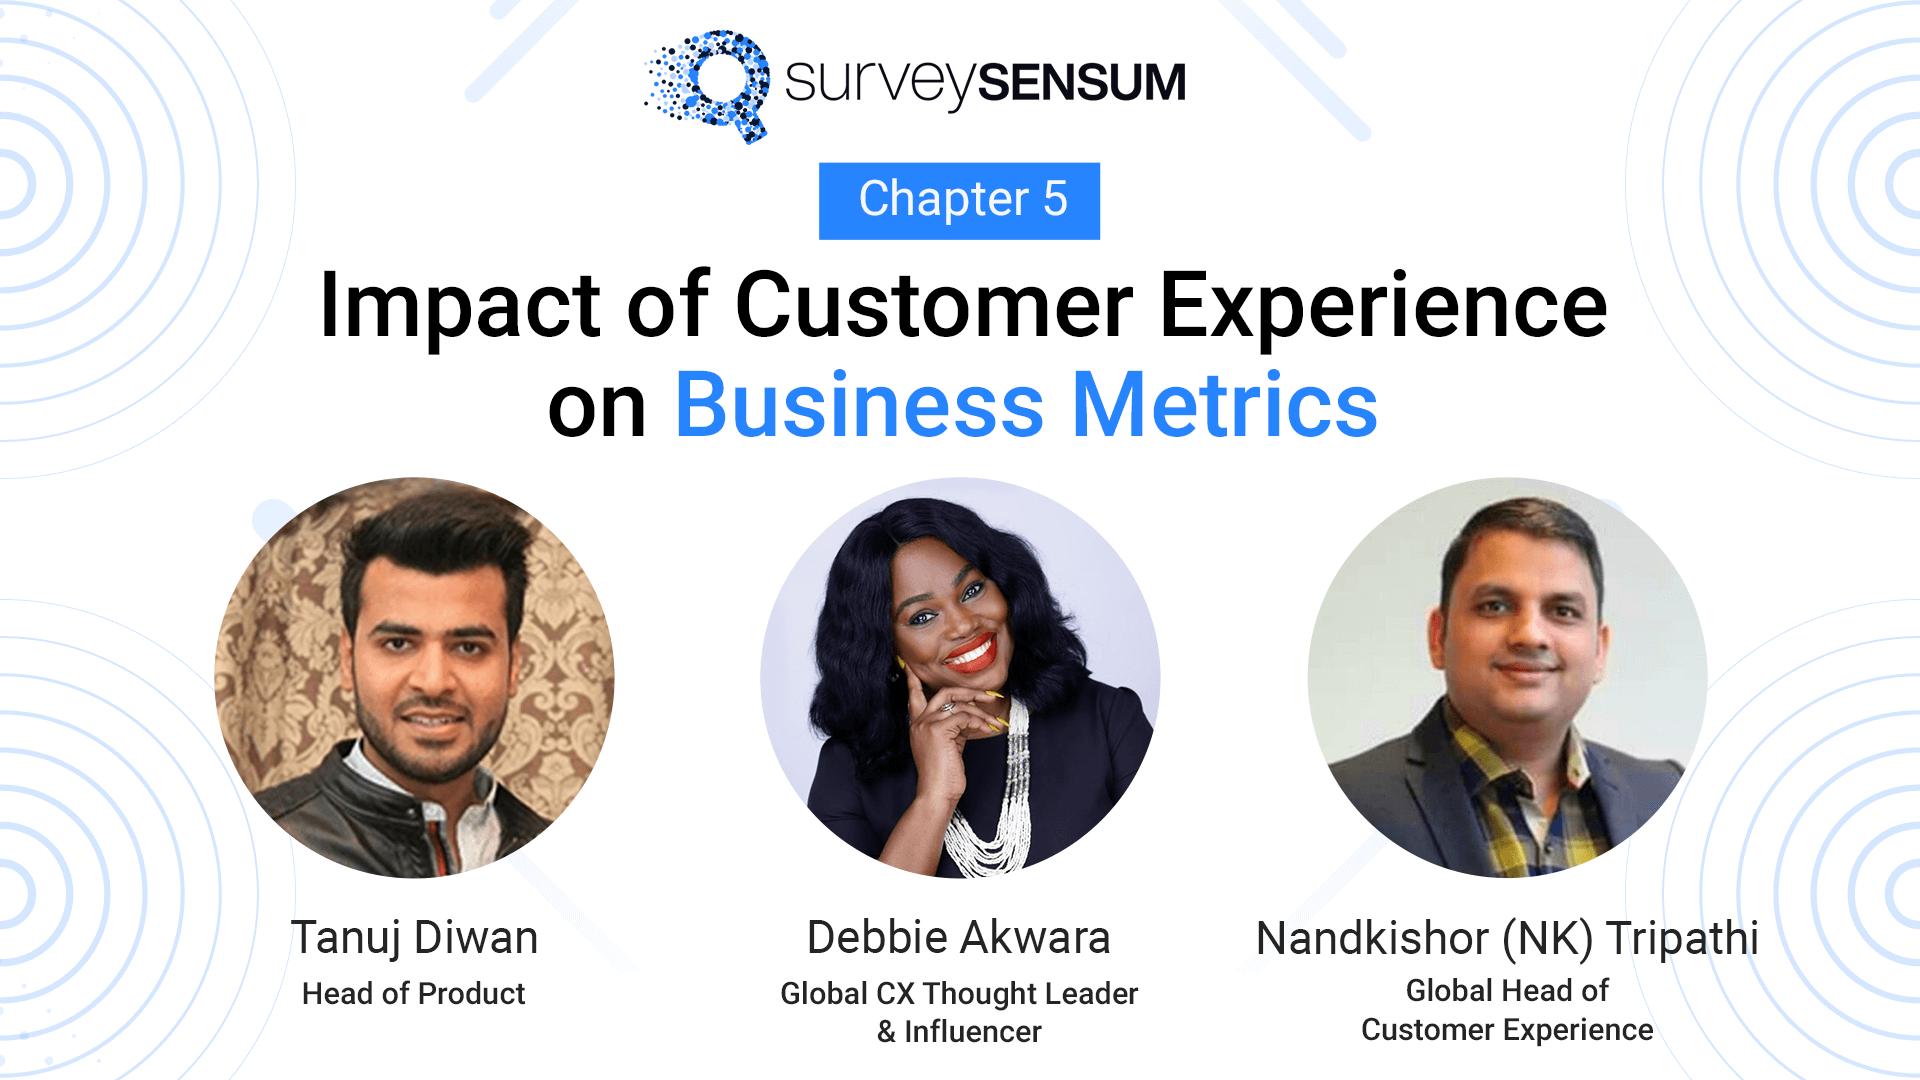 Impact of CX on Business Metrics